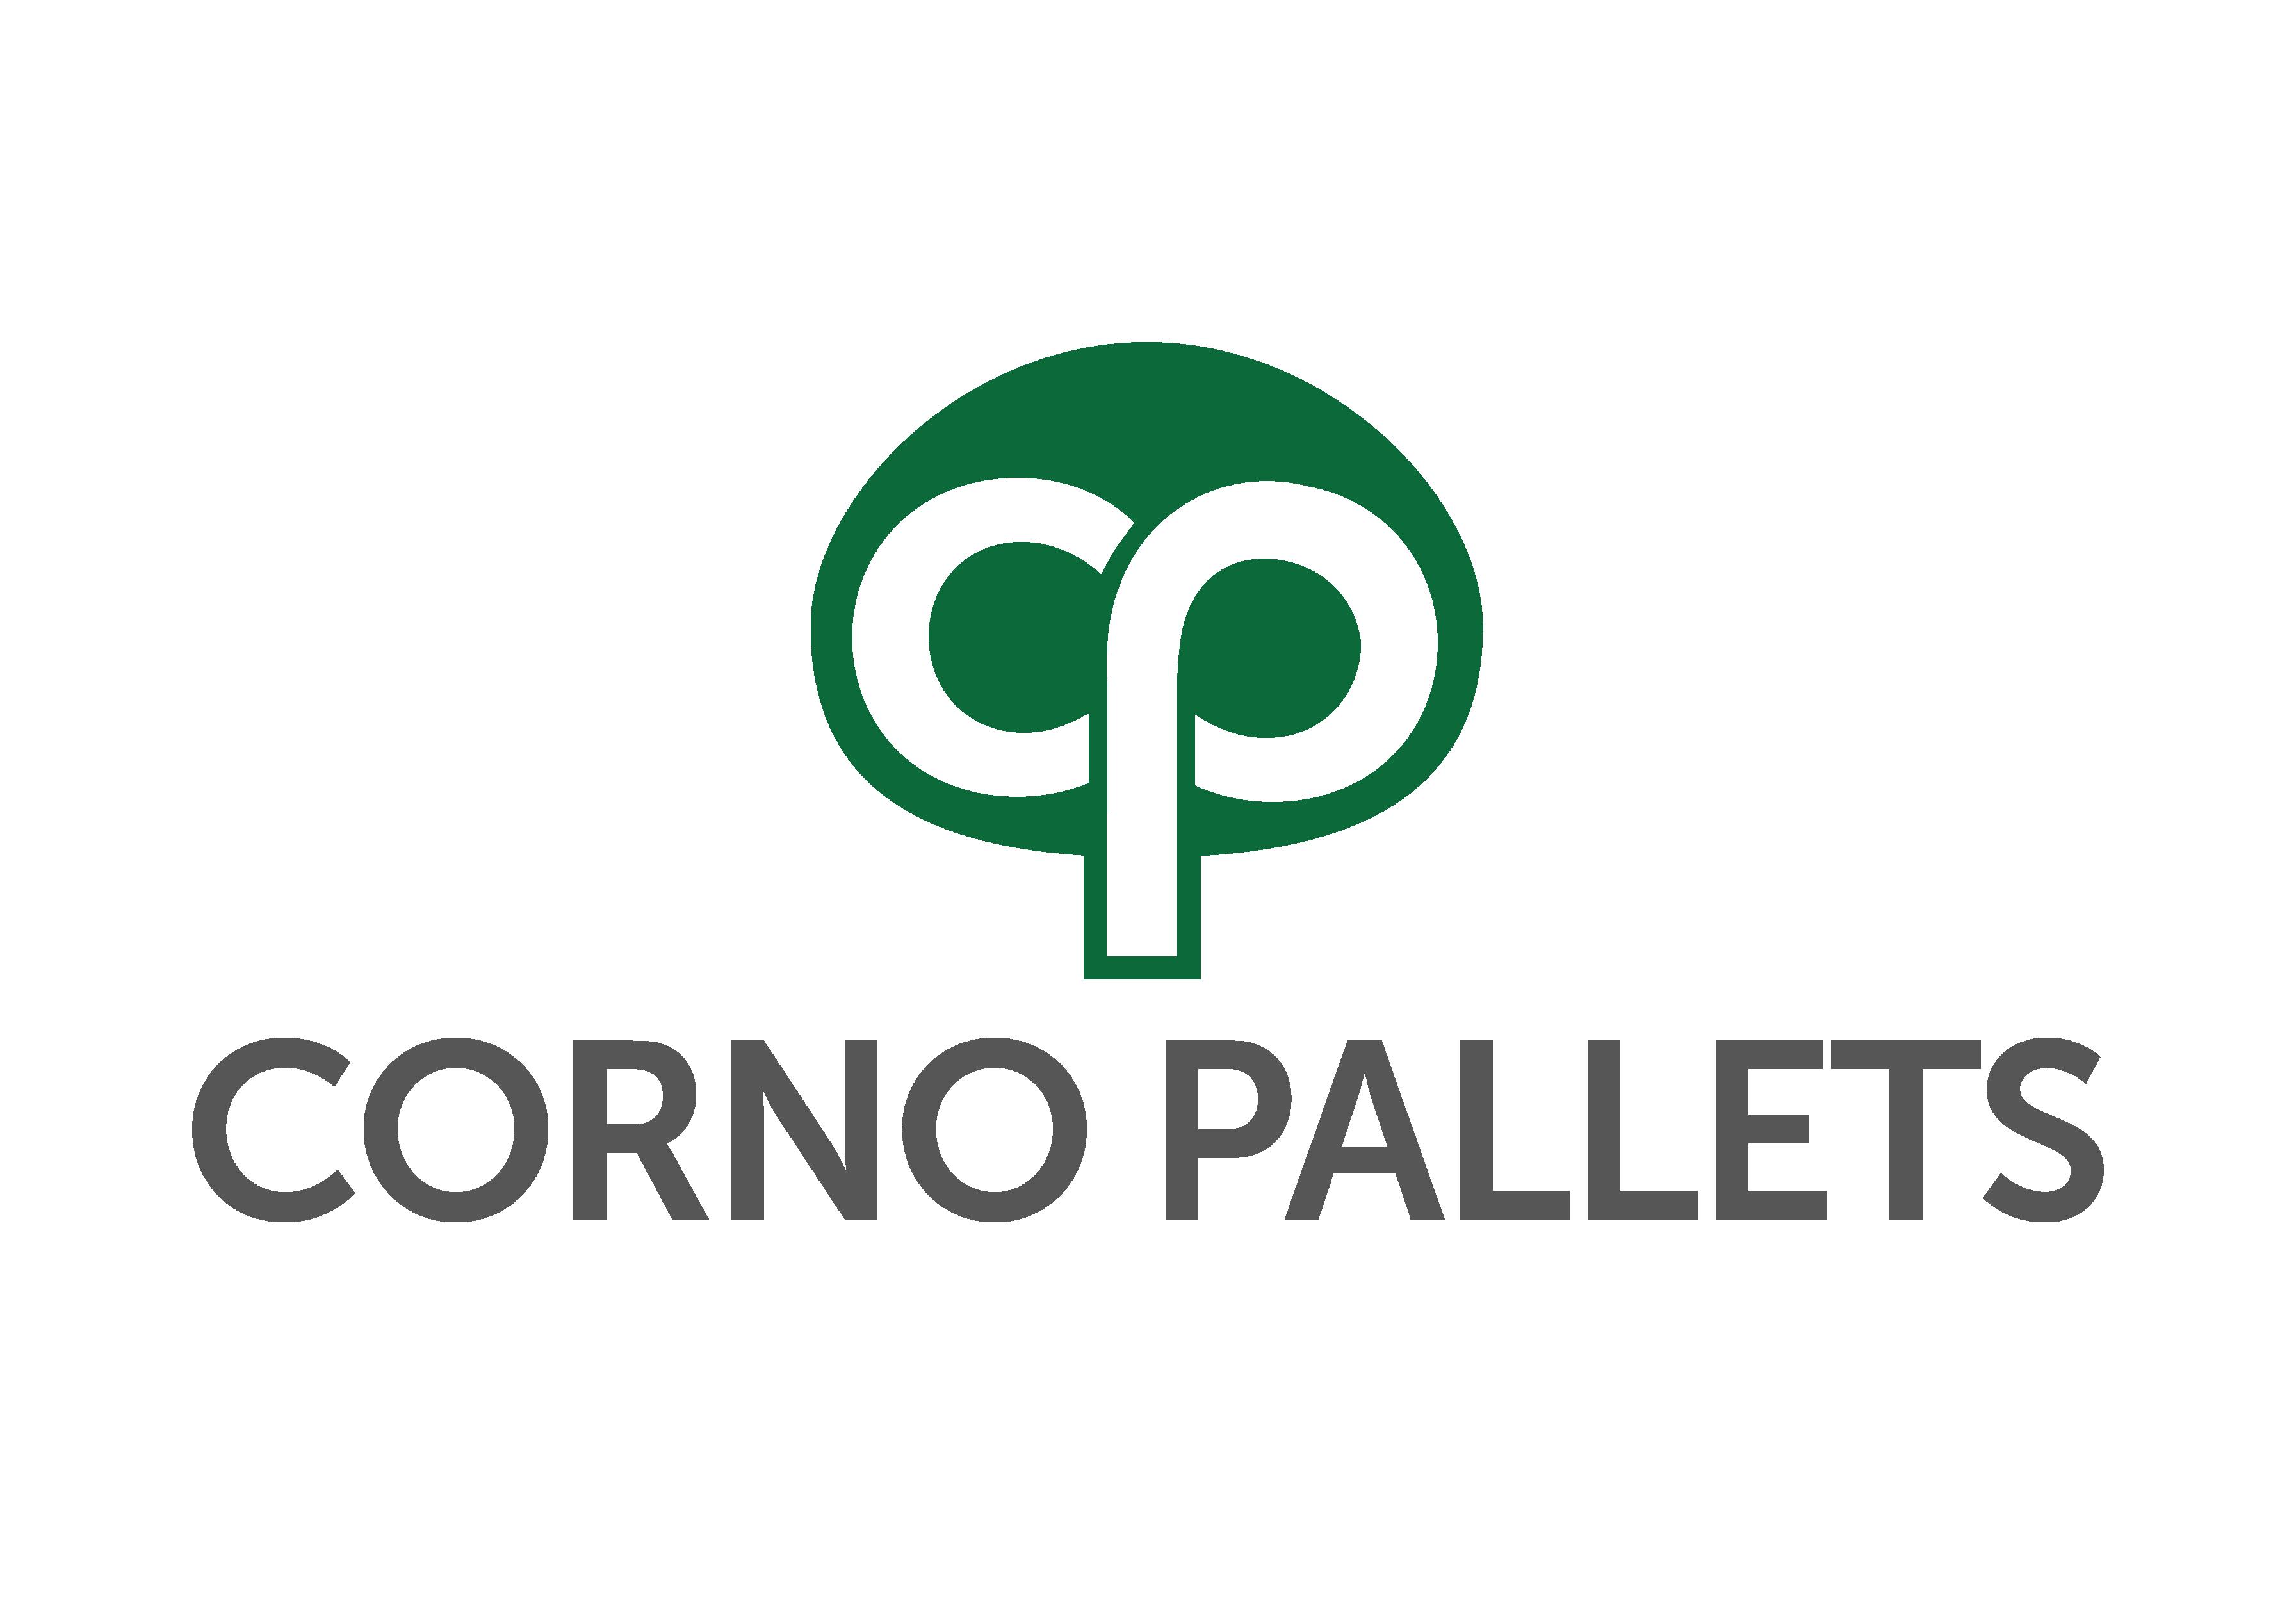 cornopallets - logo